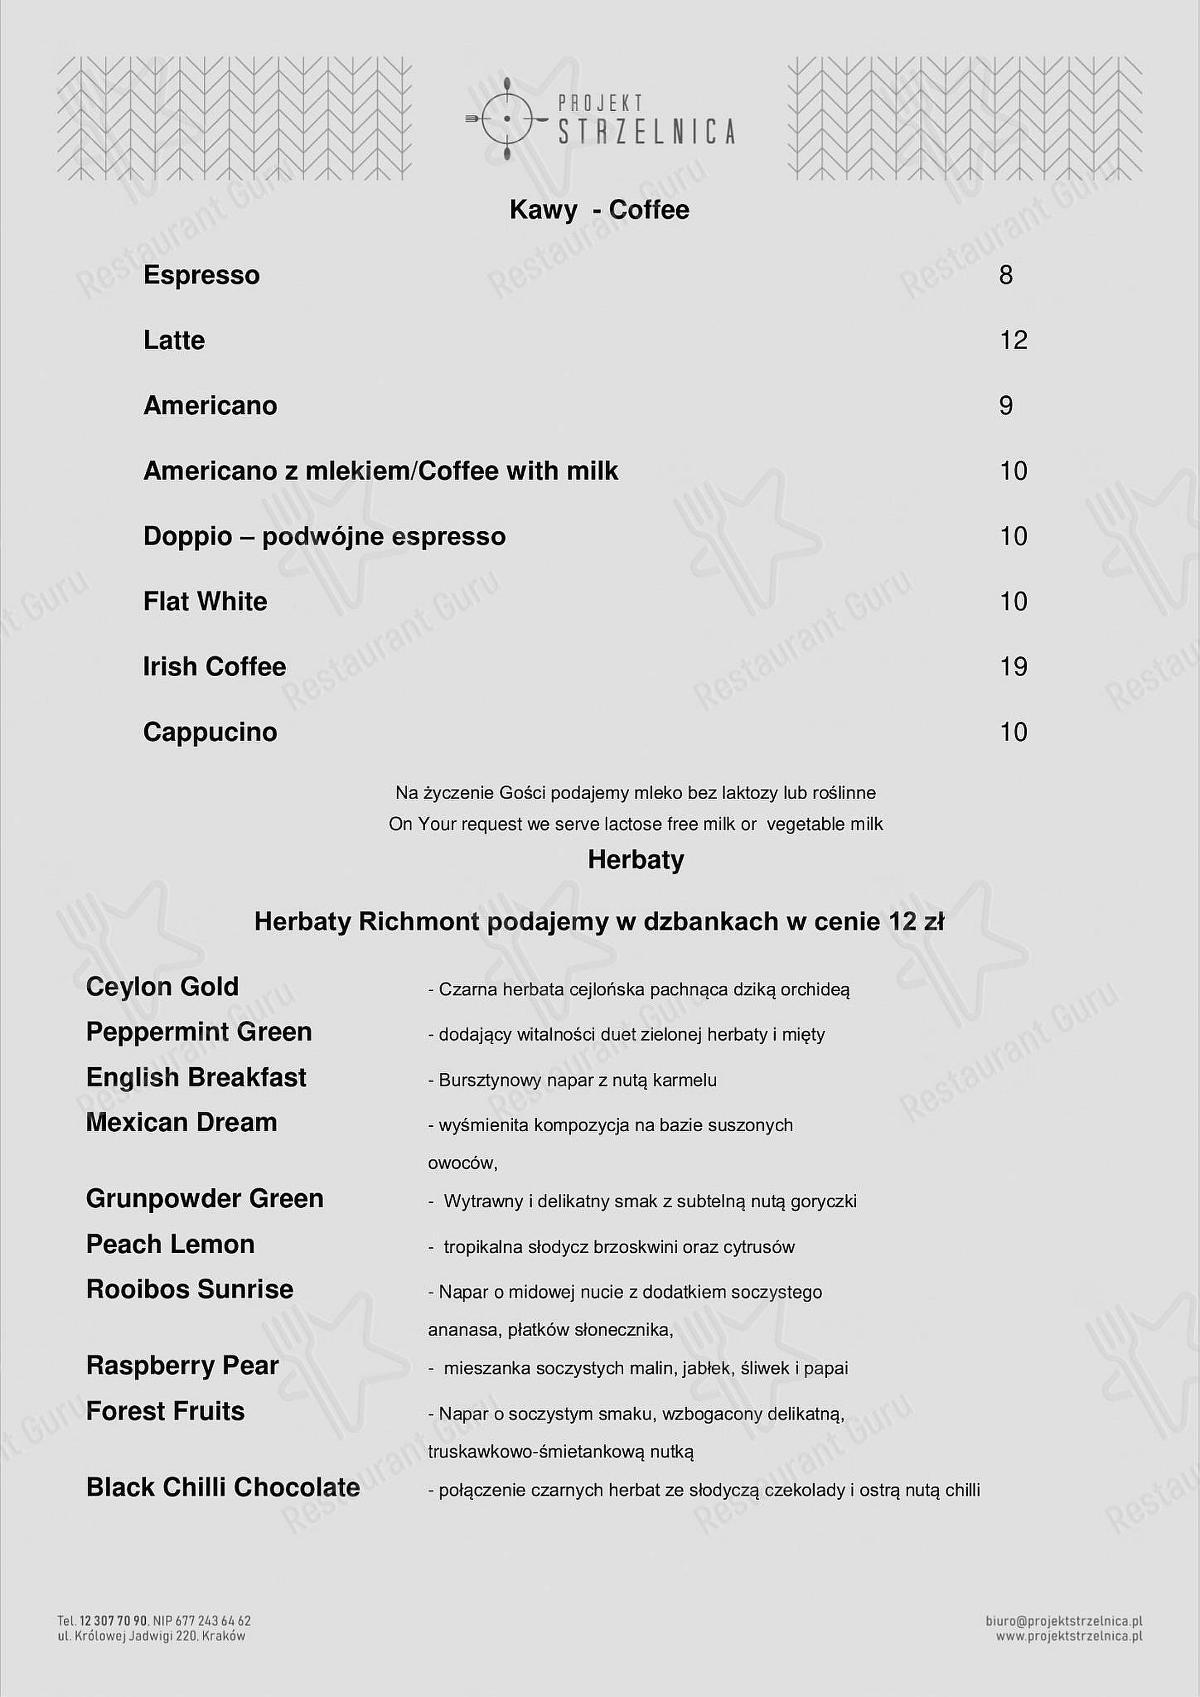 Menu for the Projekt Strzelnica restaurant